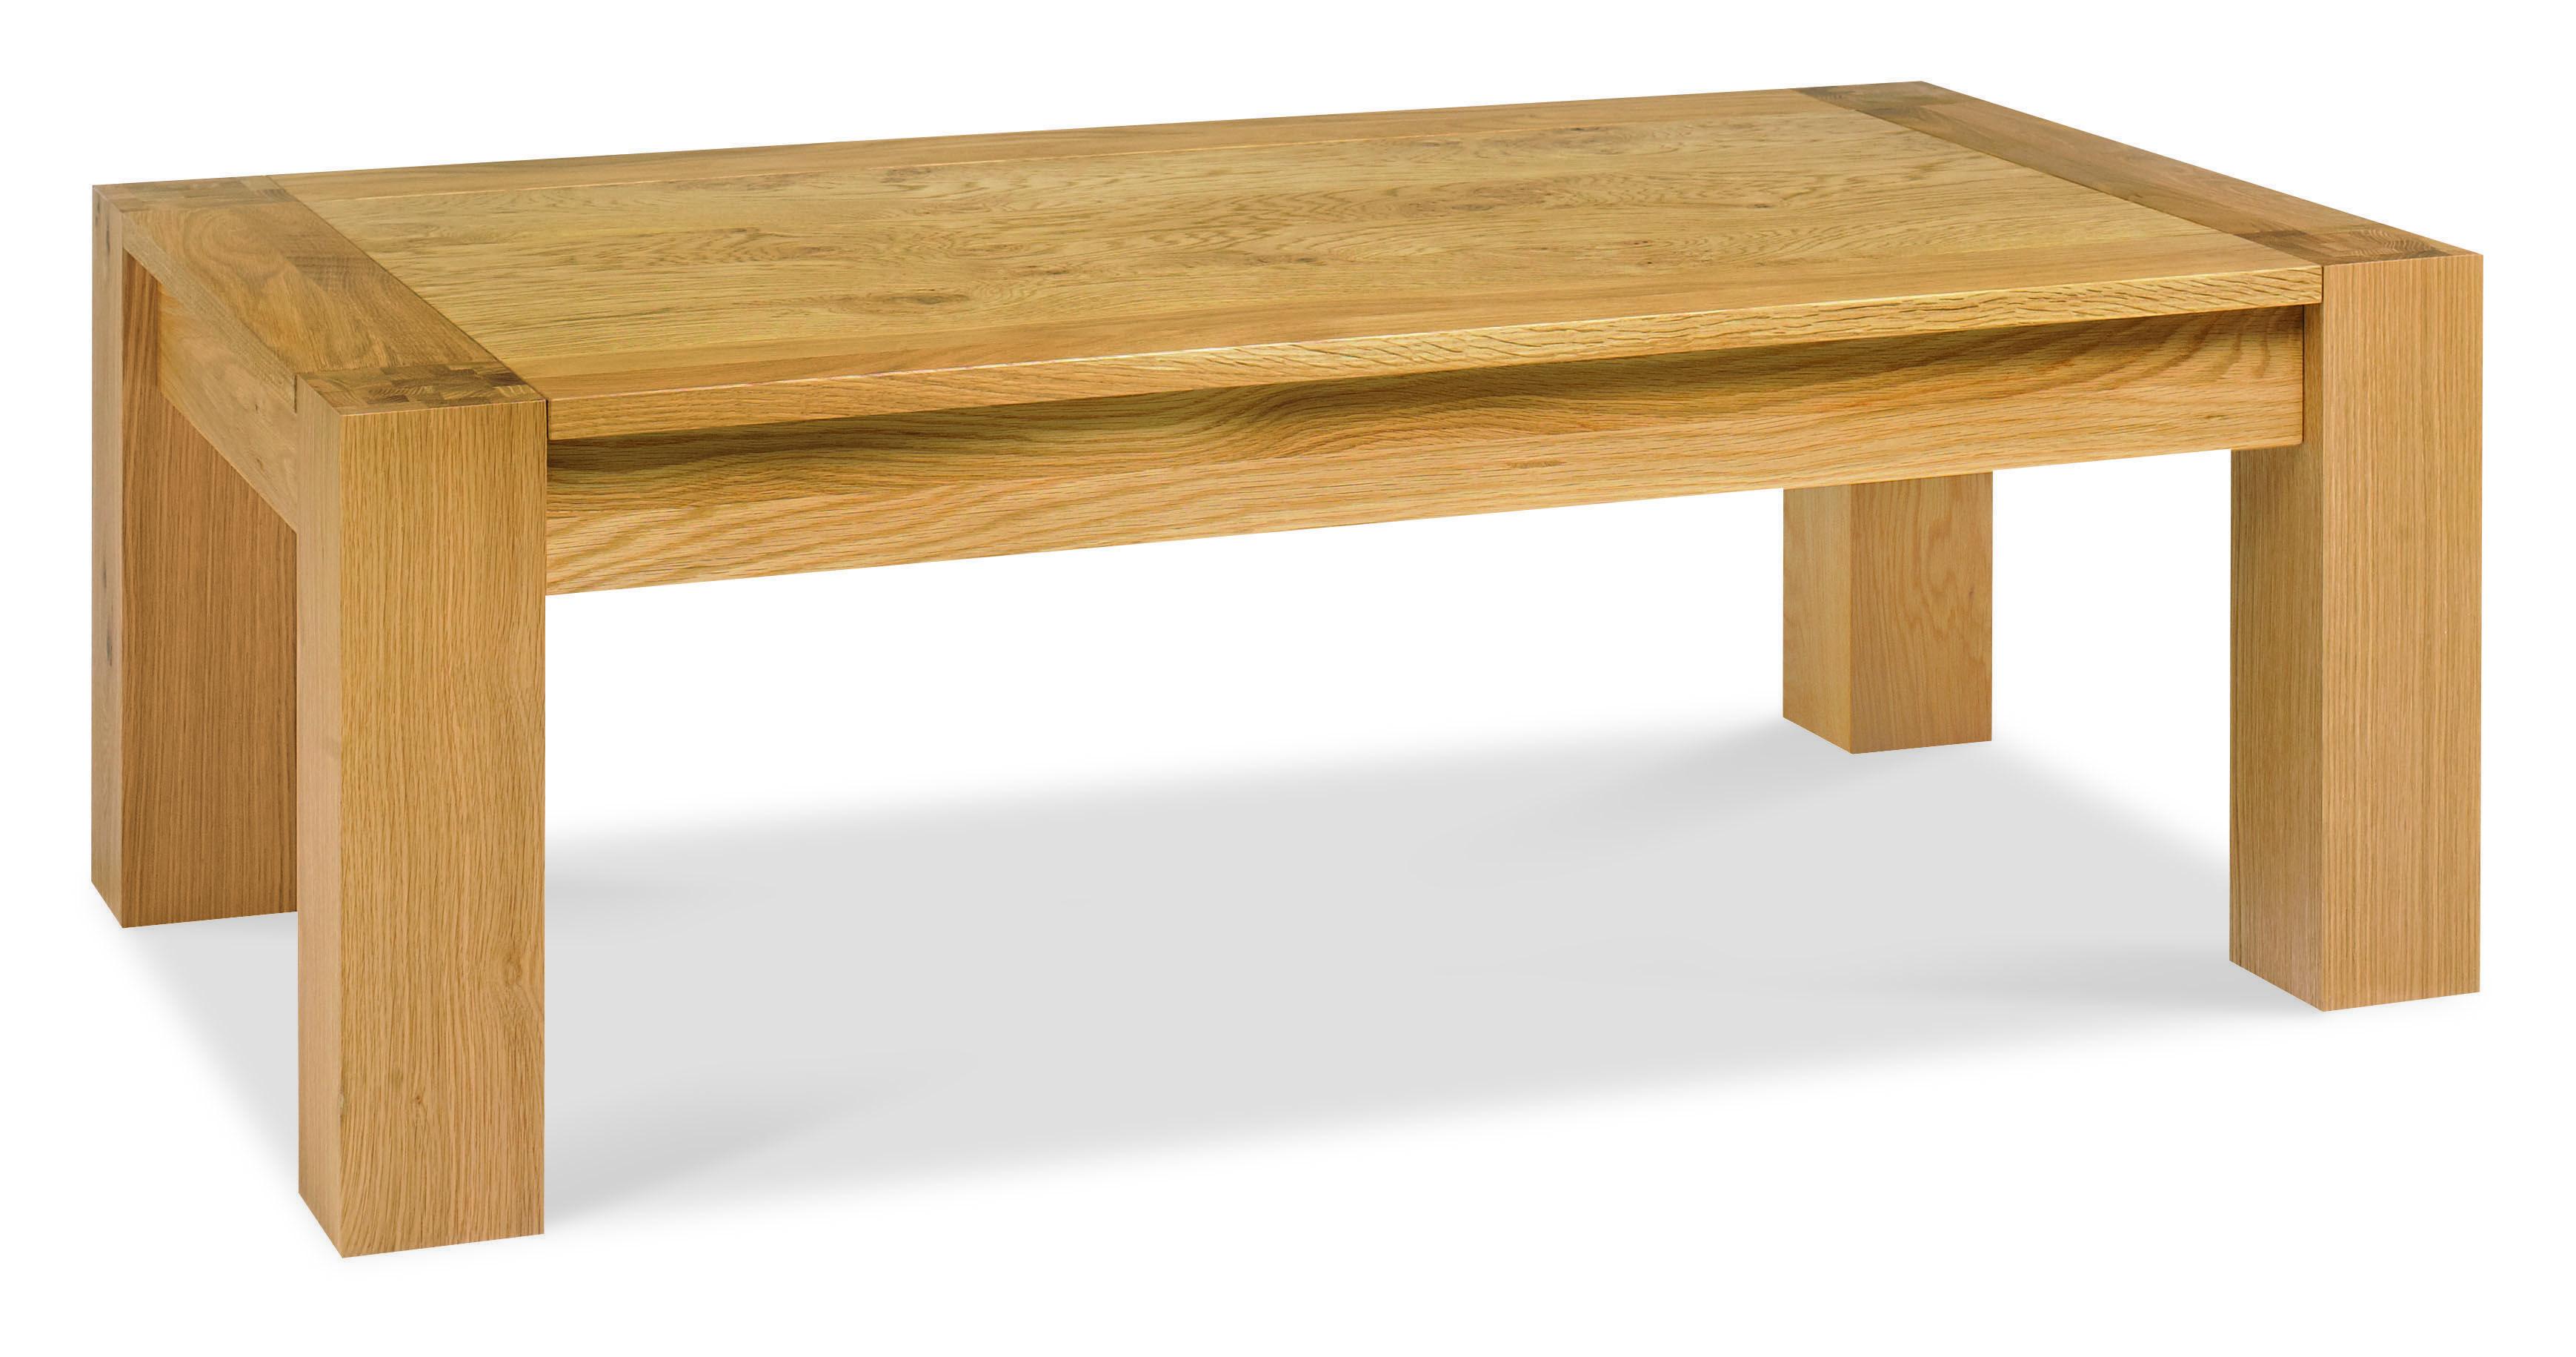 Lyon oak rectangular coffee table the lyon oak furniture lyon oak rectangular coffee table the lyon oak furniture collection from renowned supplier bentley designs is geotapseo Gallery